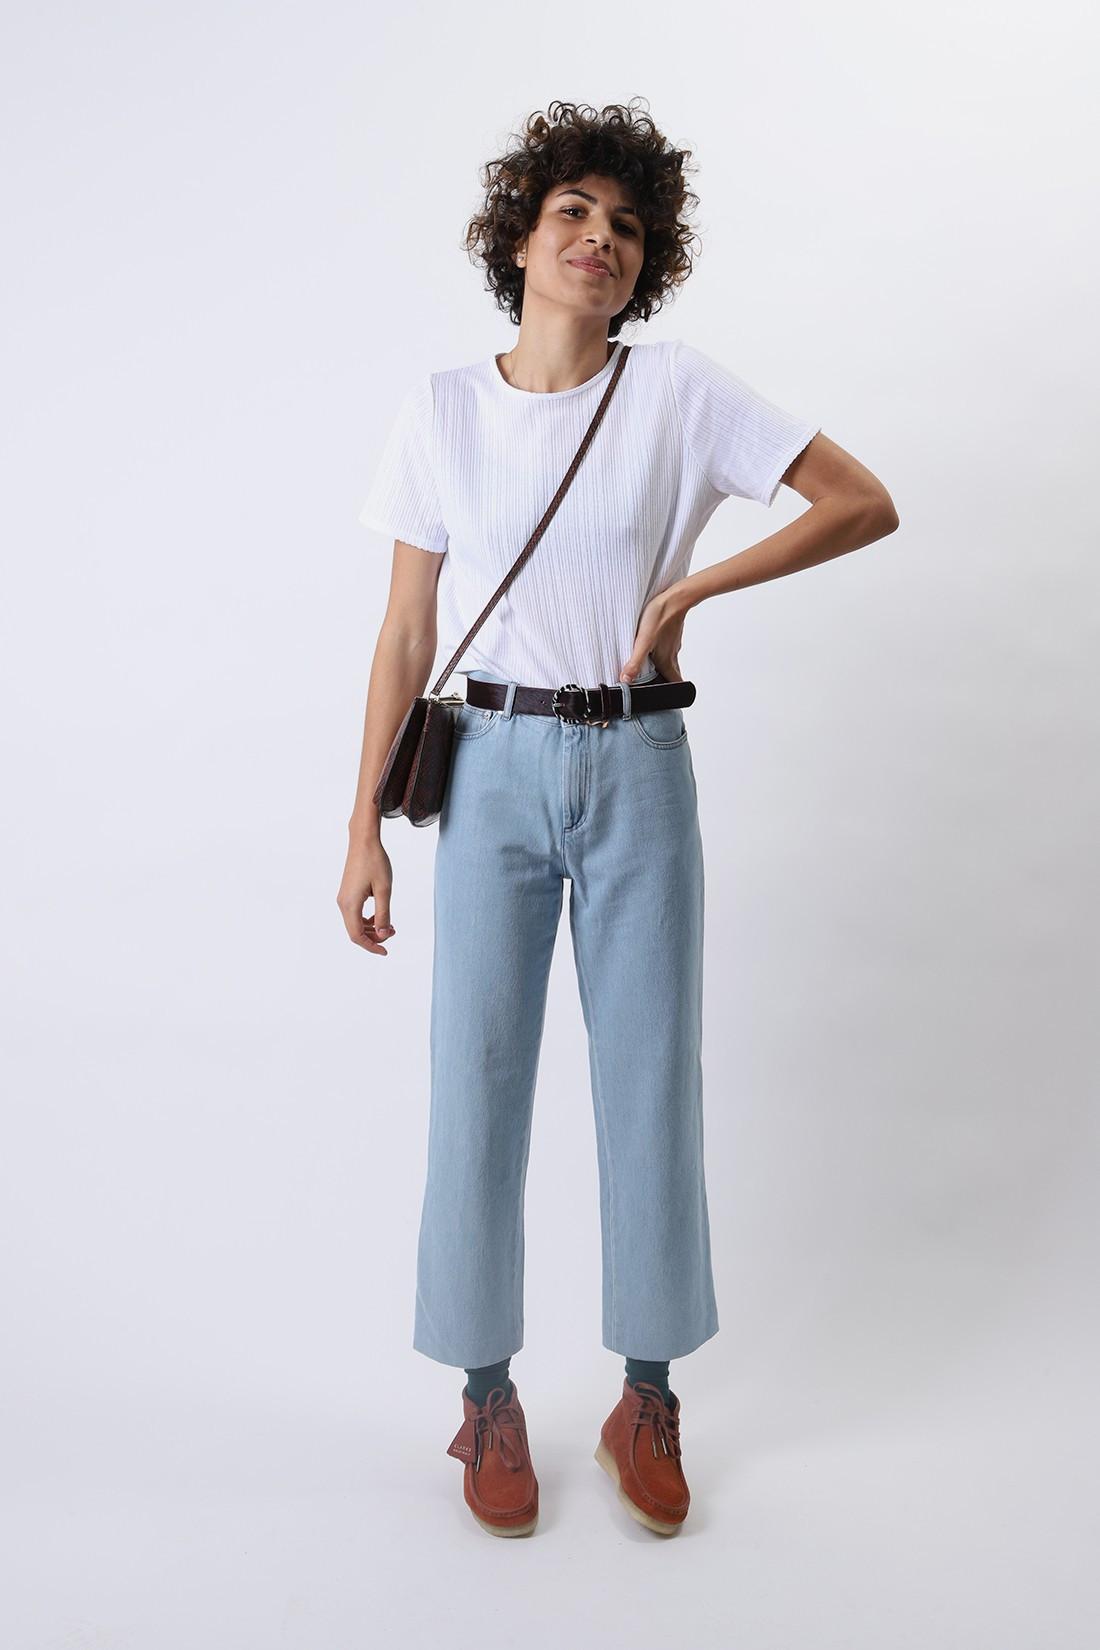 A.P.C. FOR WOMAN / T-shirt elsie Blanc